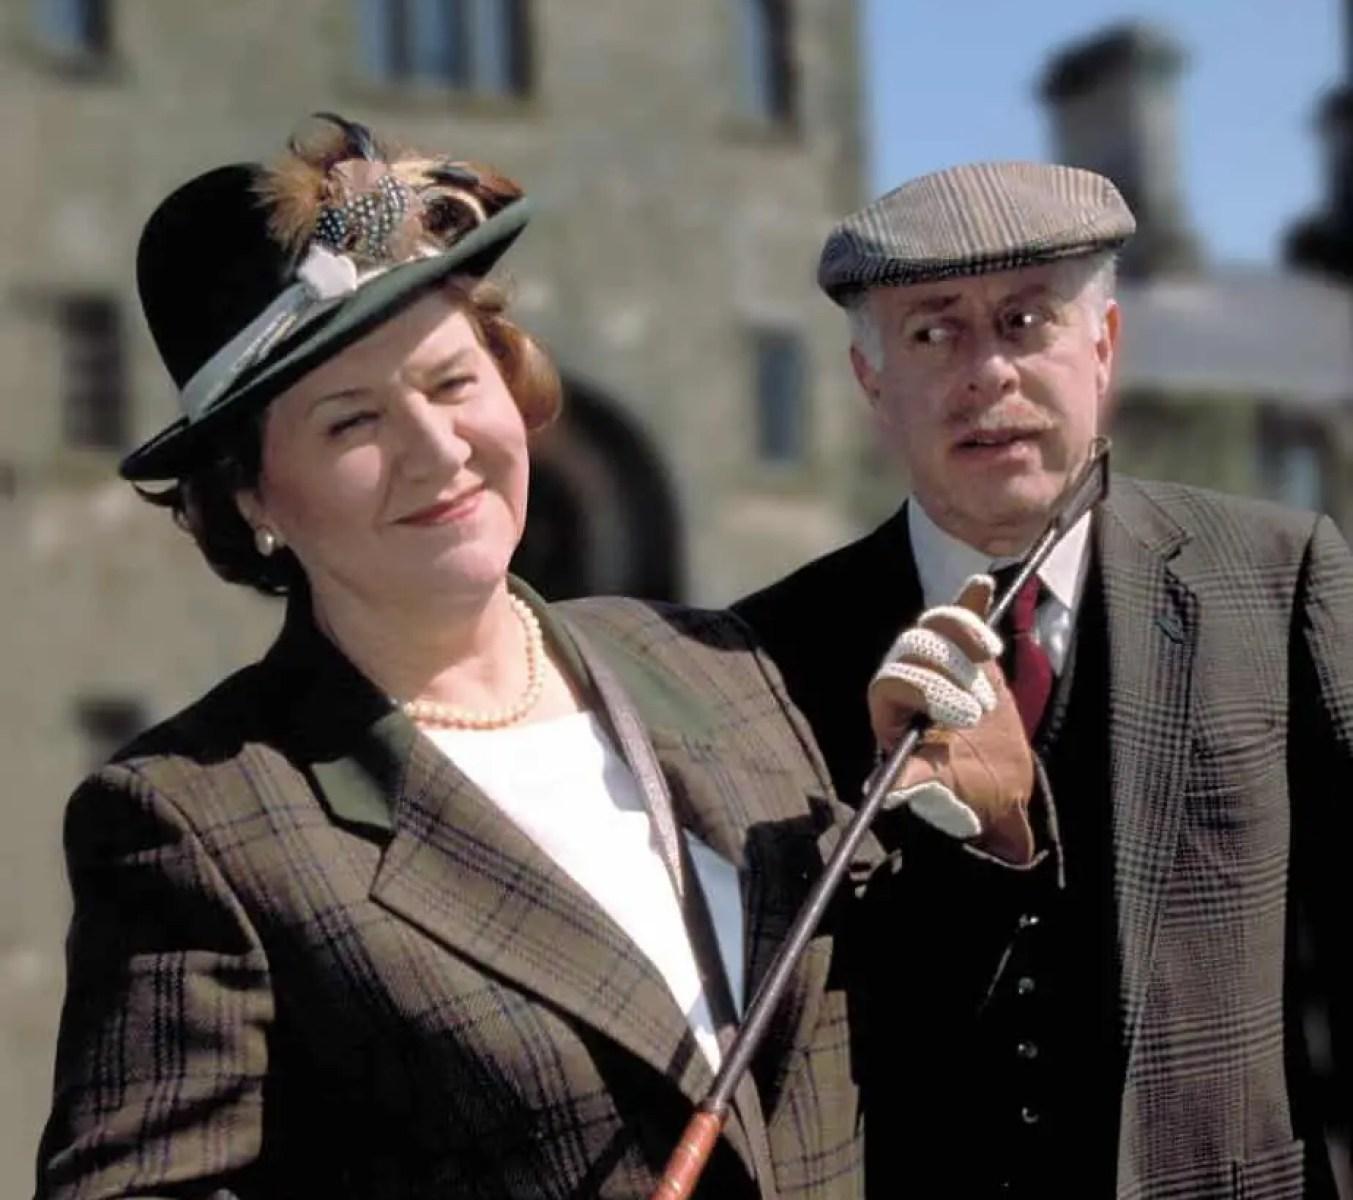 socially aspiring woman Hyacinth Bucket and her husband Richard